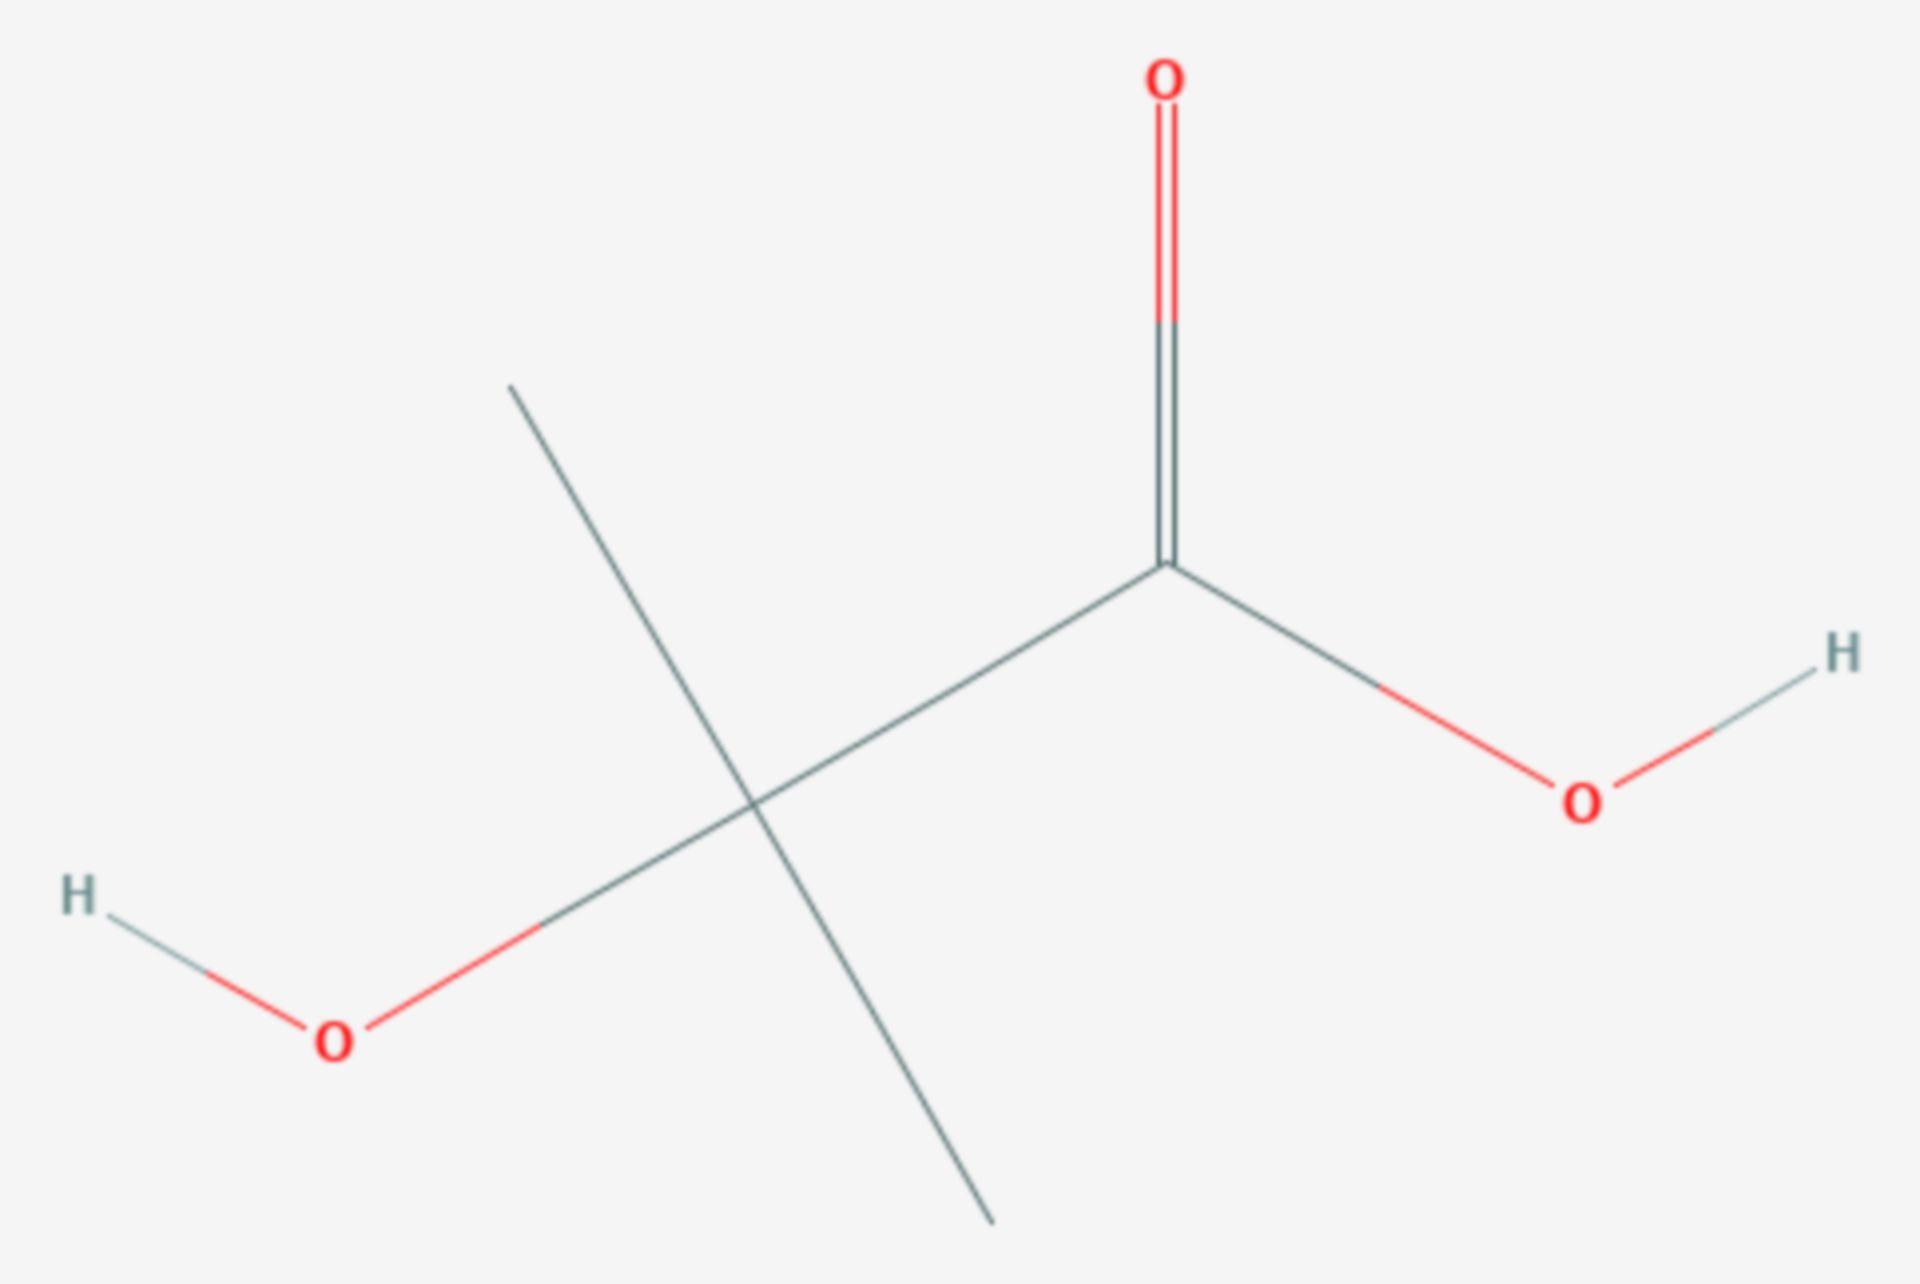 2-Hydroxyisobuttersäure (Strukturformel)